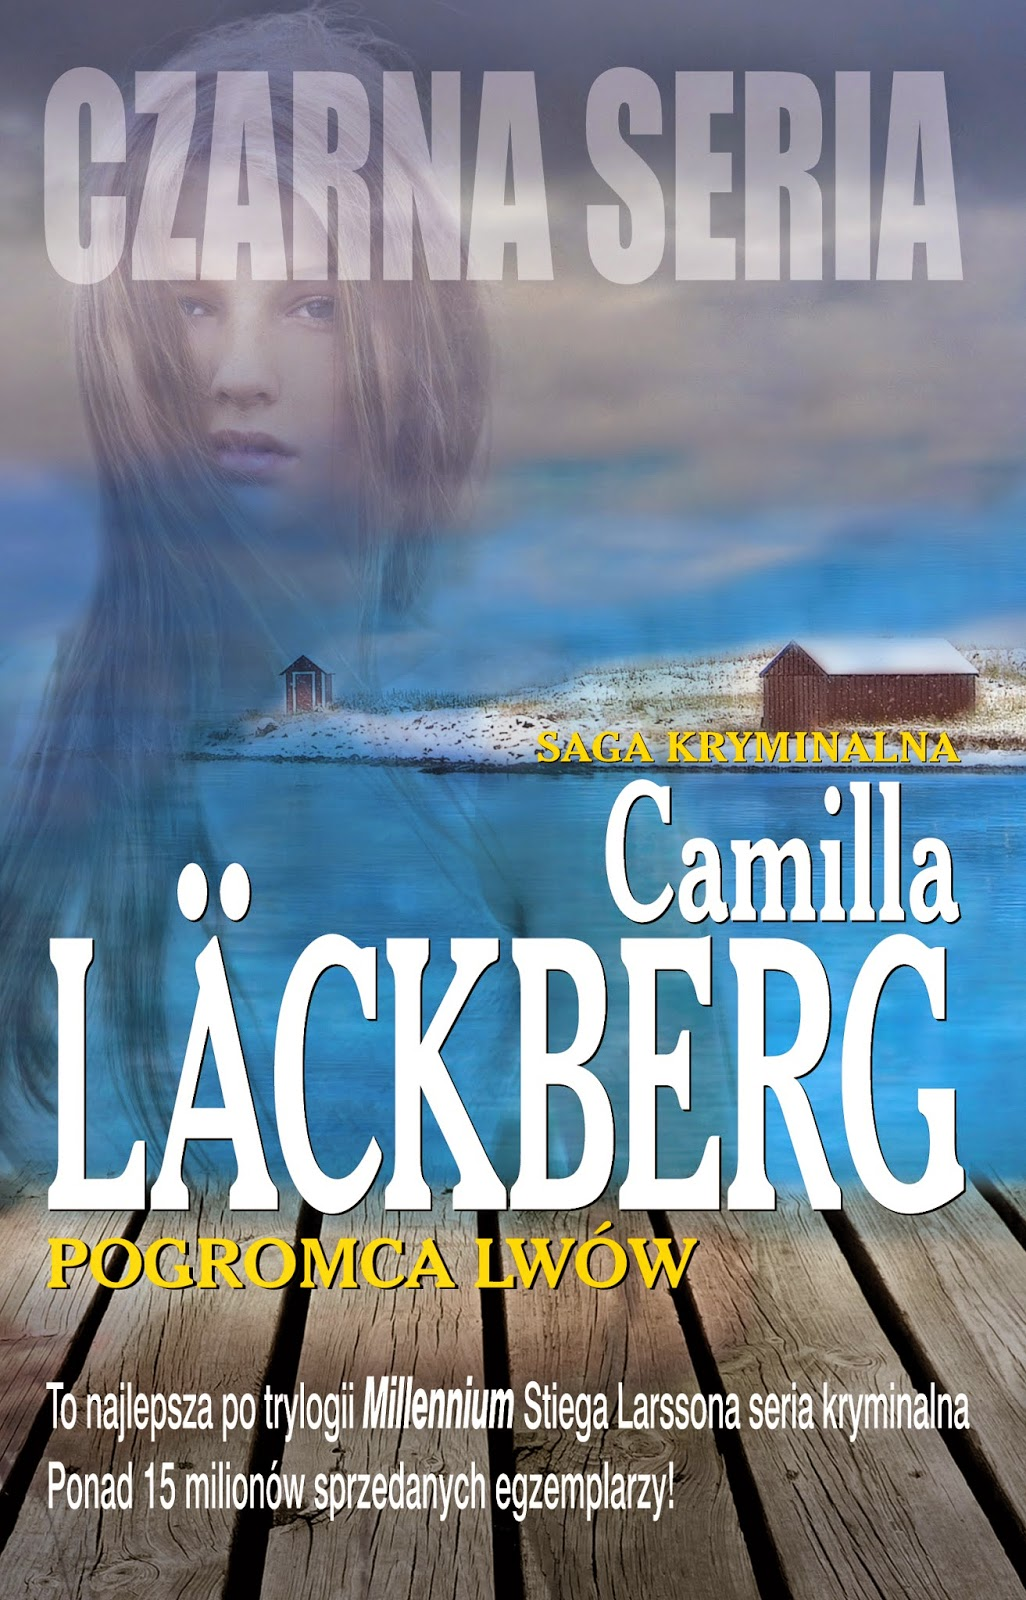 http://moja-kraina-wiecznosci.blogspot.com/2015/04/zapowiedz-camilla-lackberg-pogromca.html